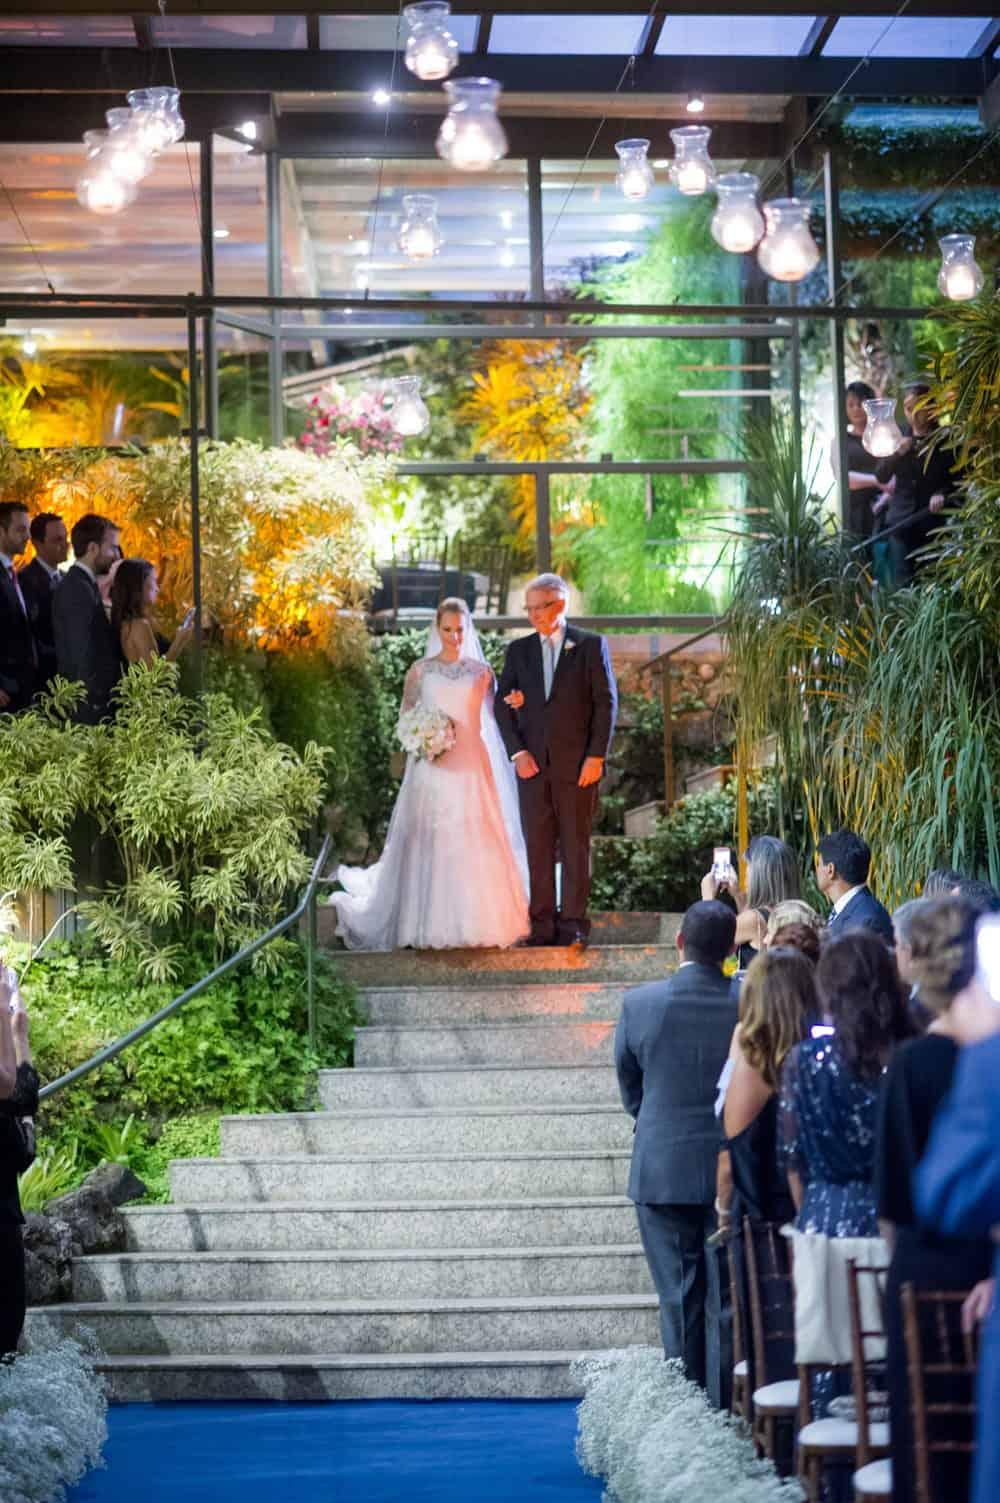 casamento-carol-e-paulo-caseme-marina-fava-fotografia-5